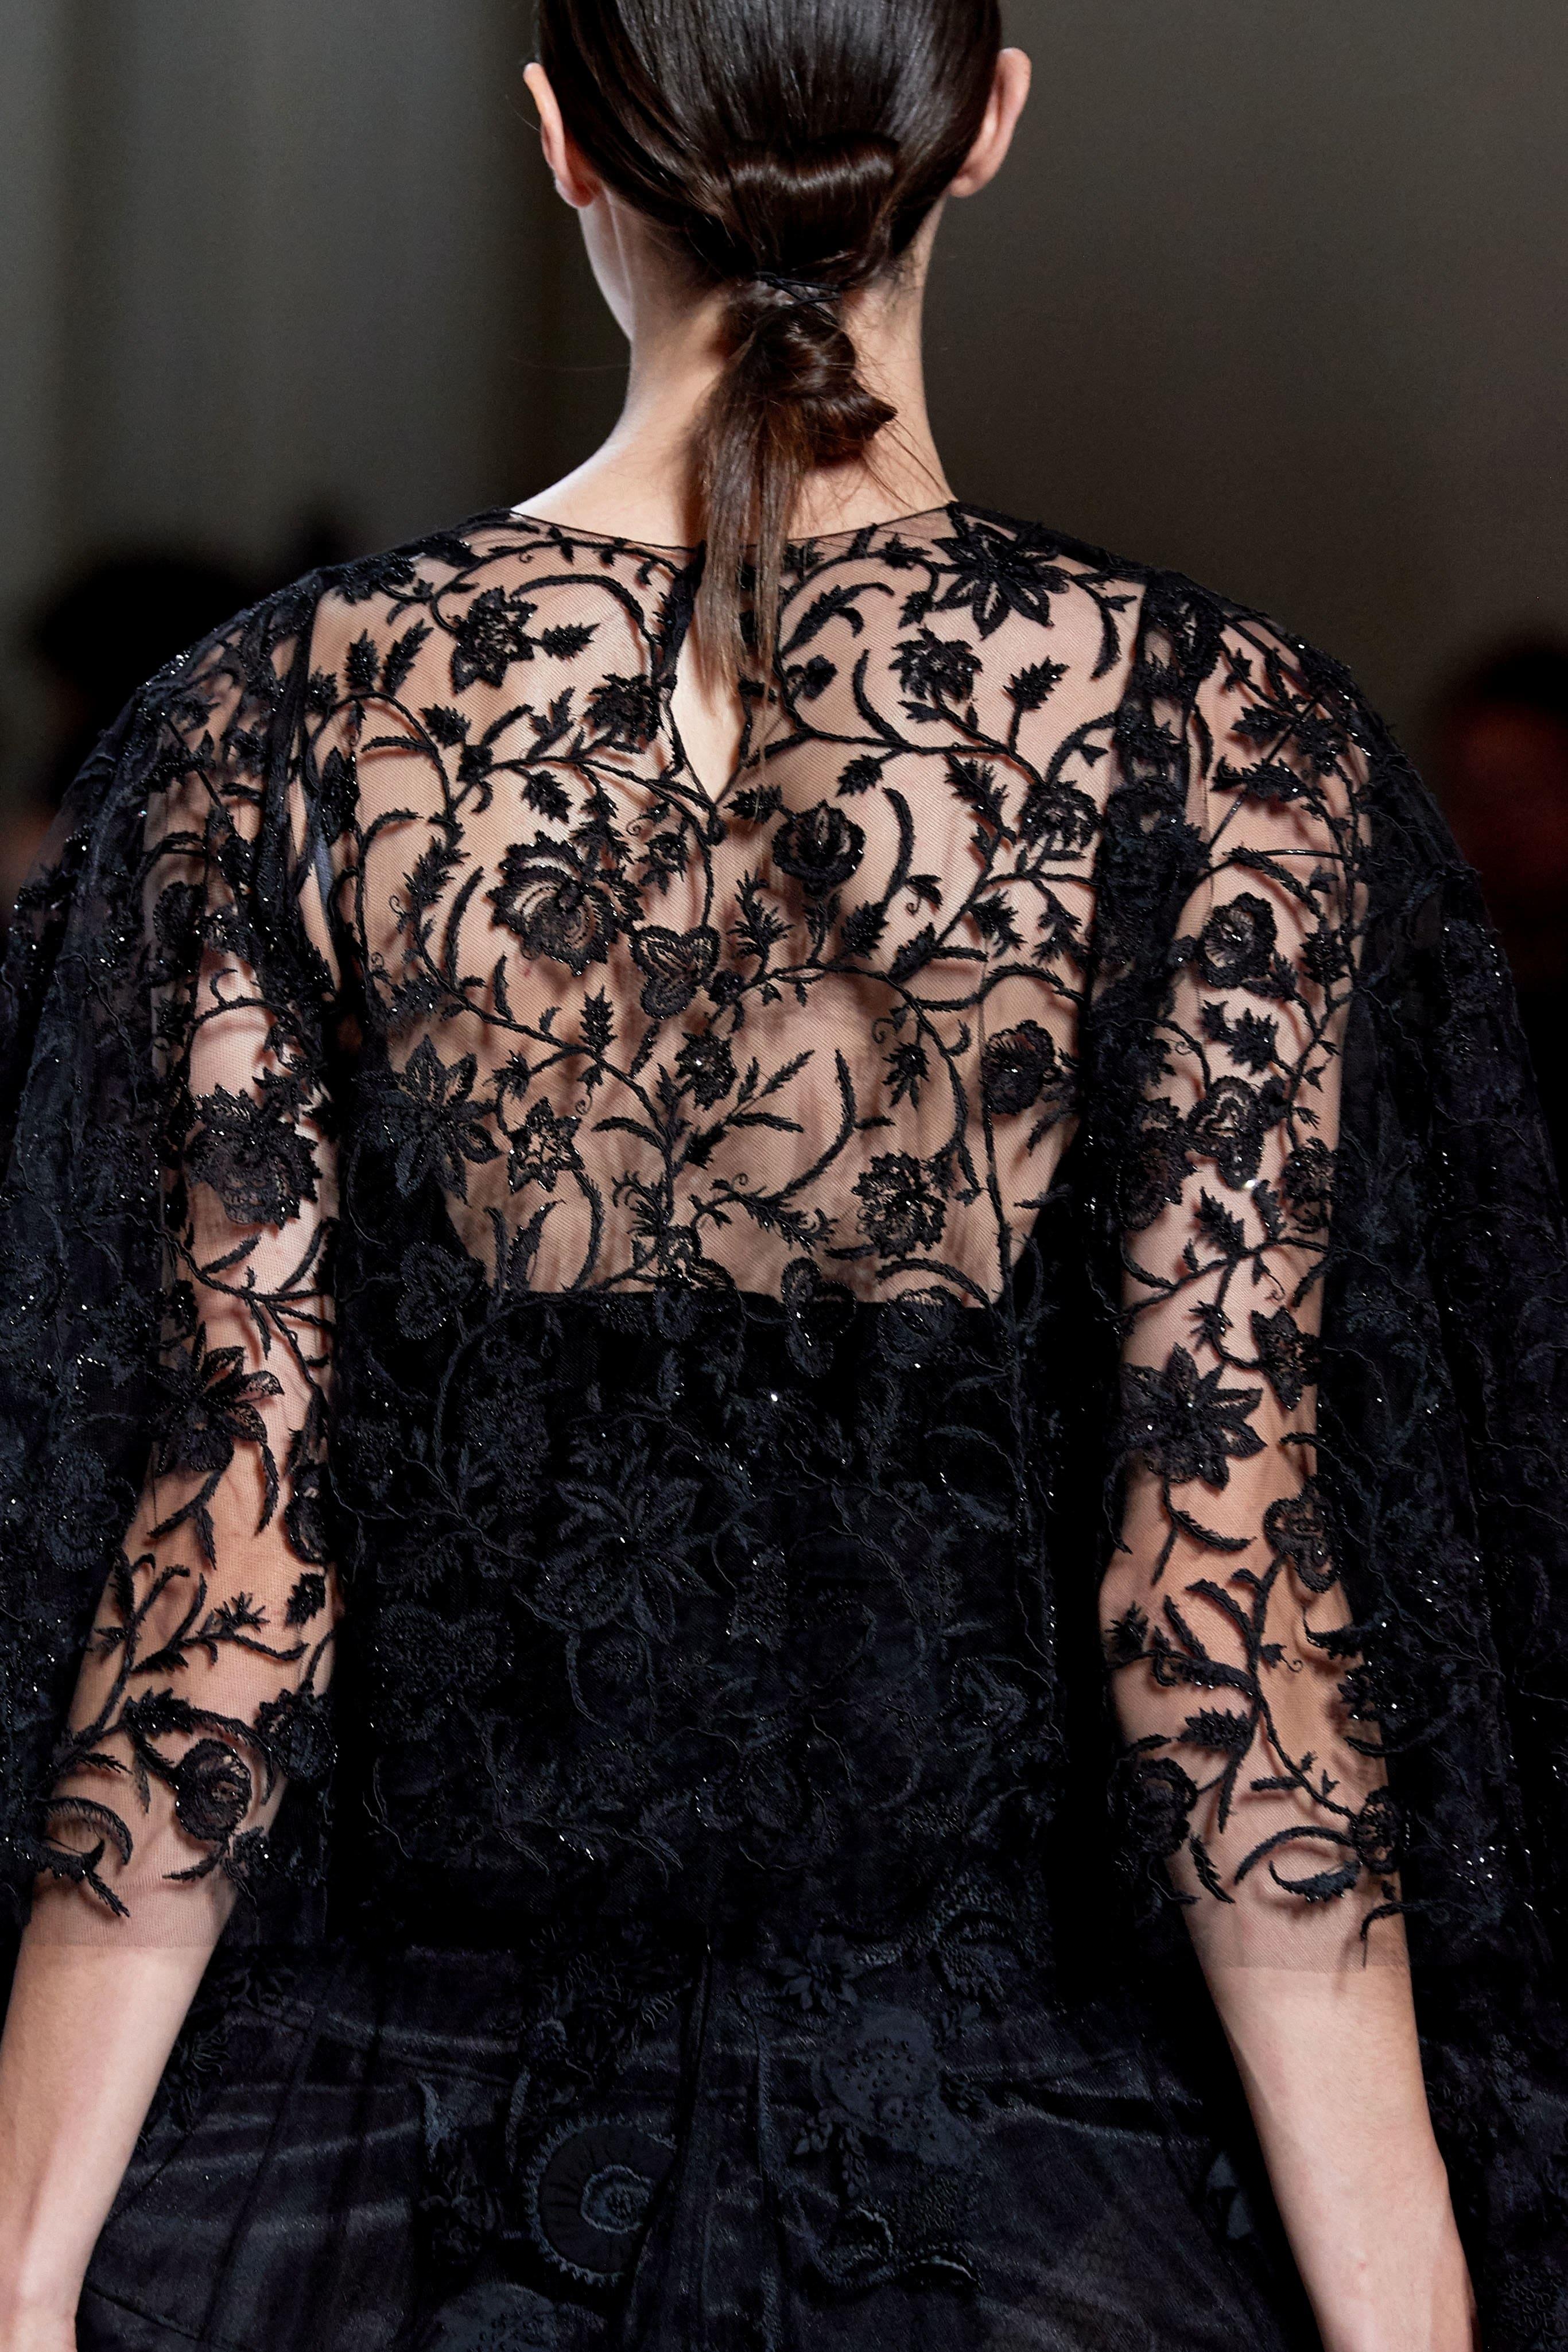 Платье из коллекции Givenchy Fall/Winter 2019 Couture